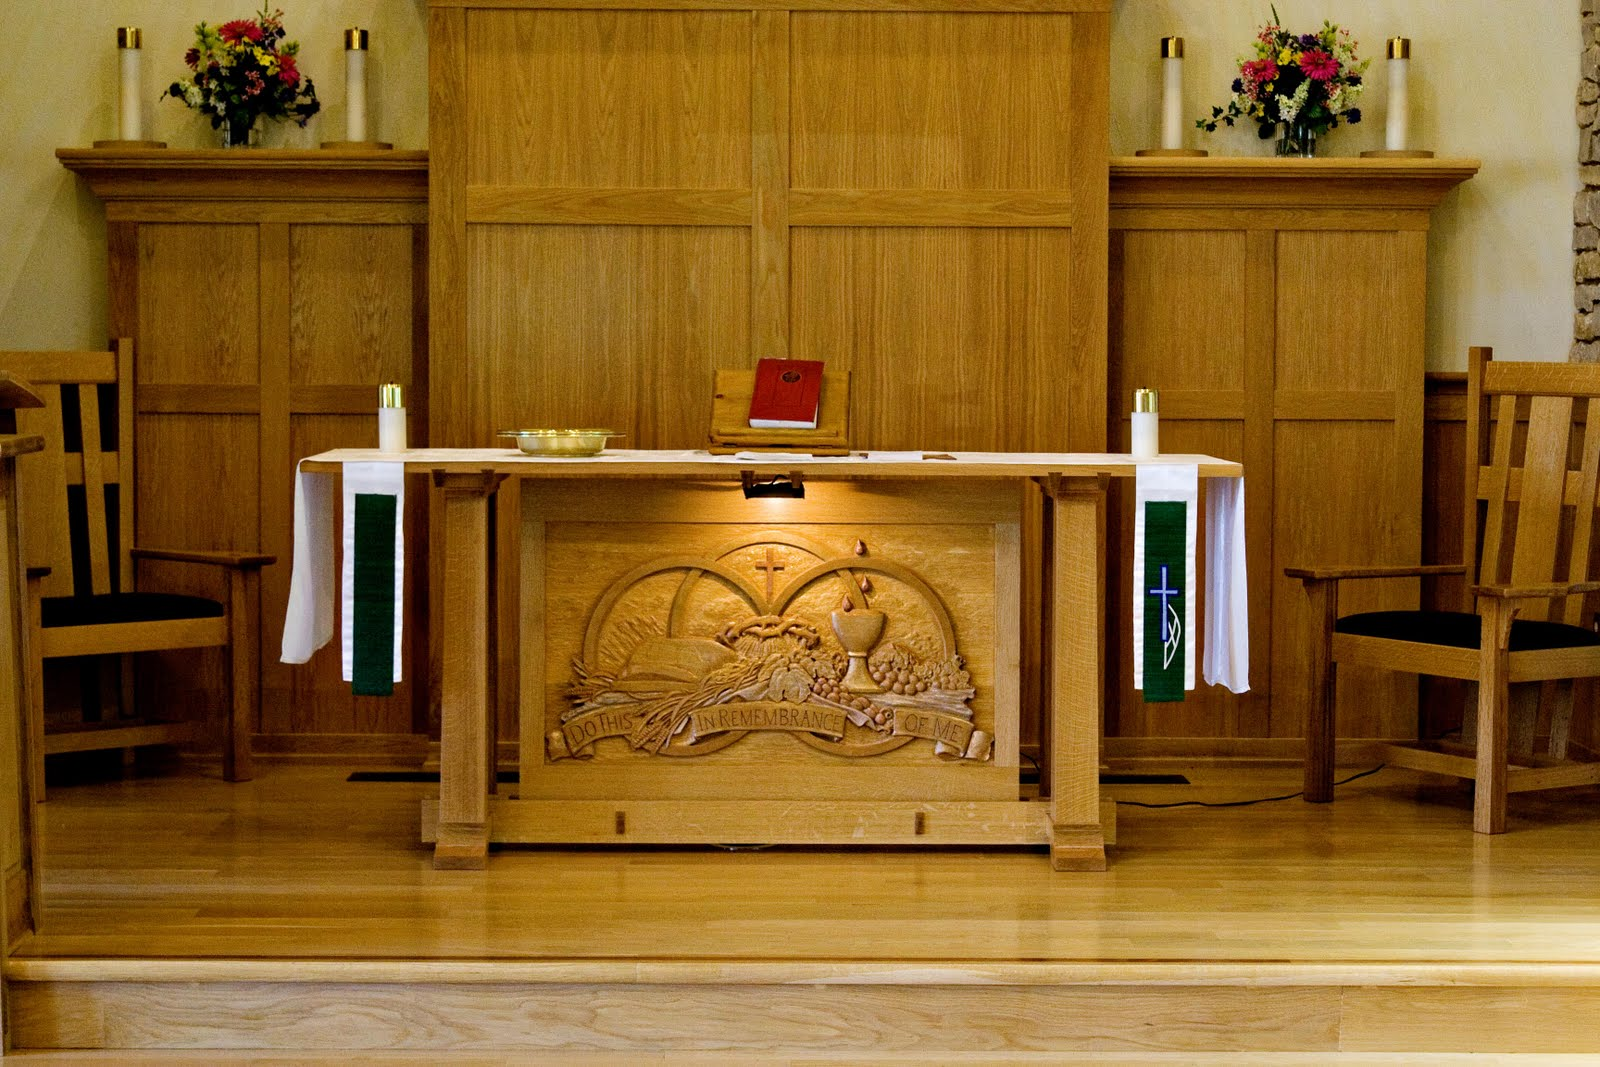 Golden Studios: Bethel Altar Carving